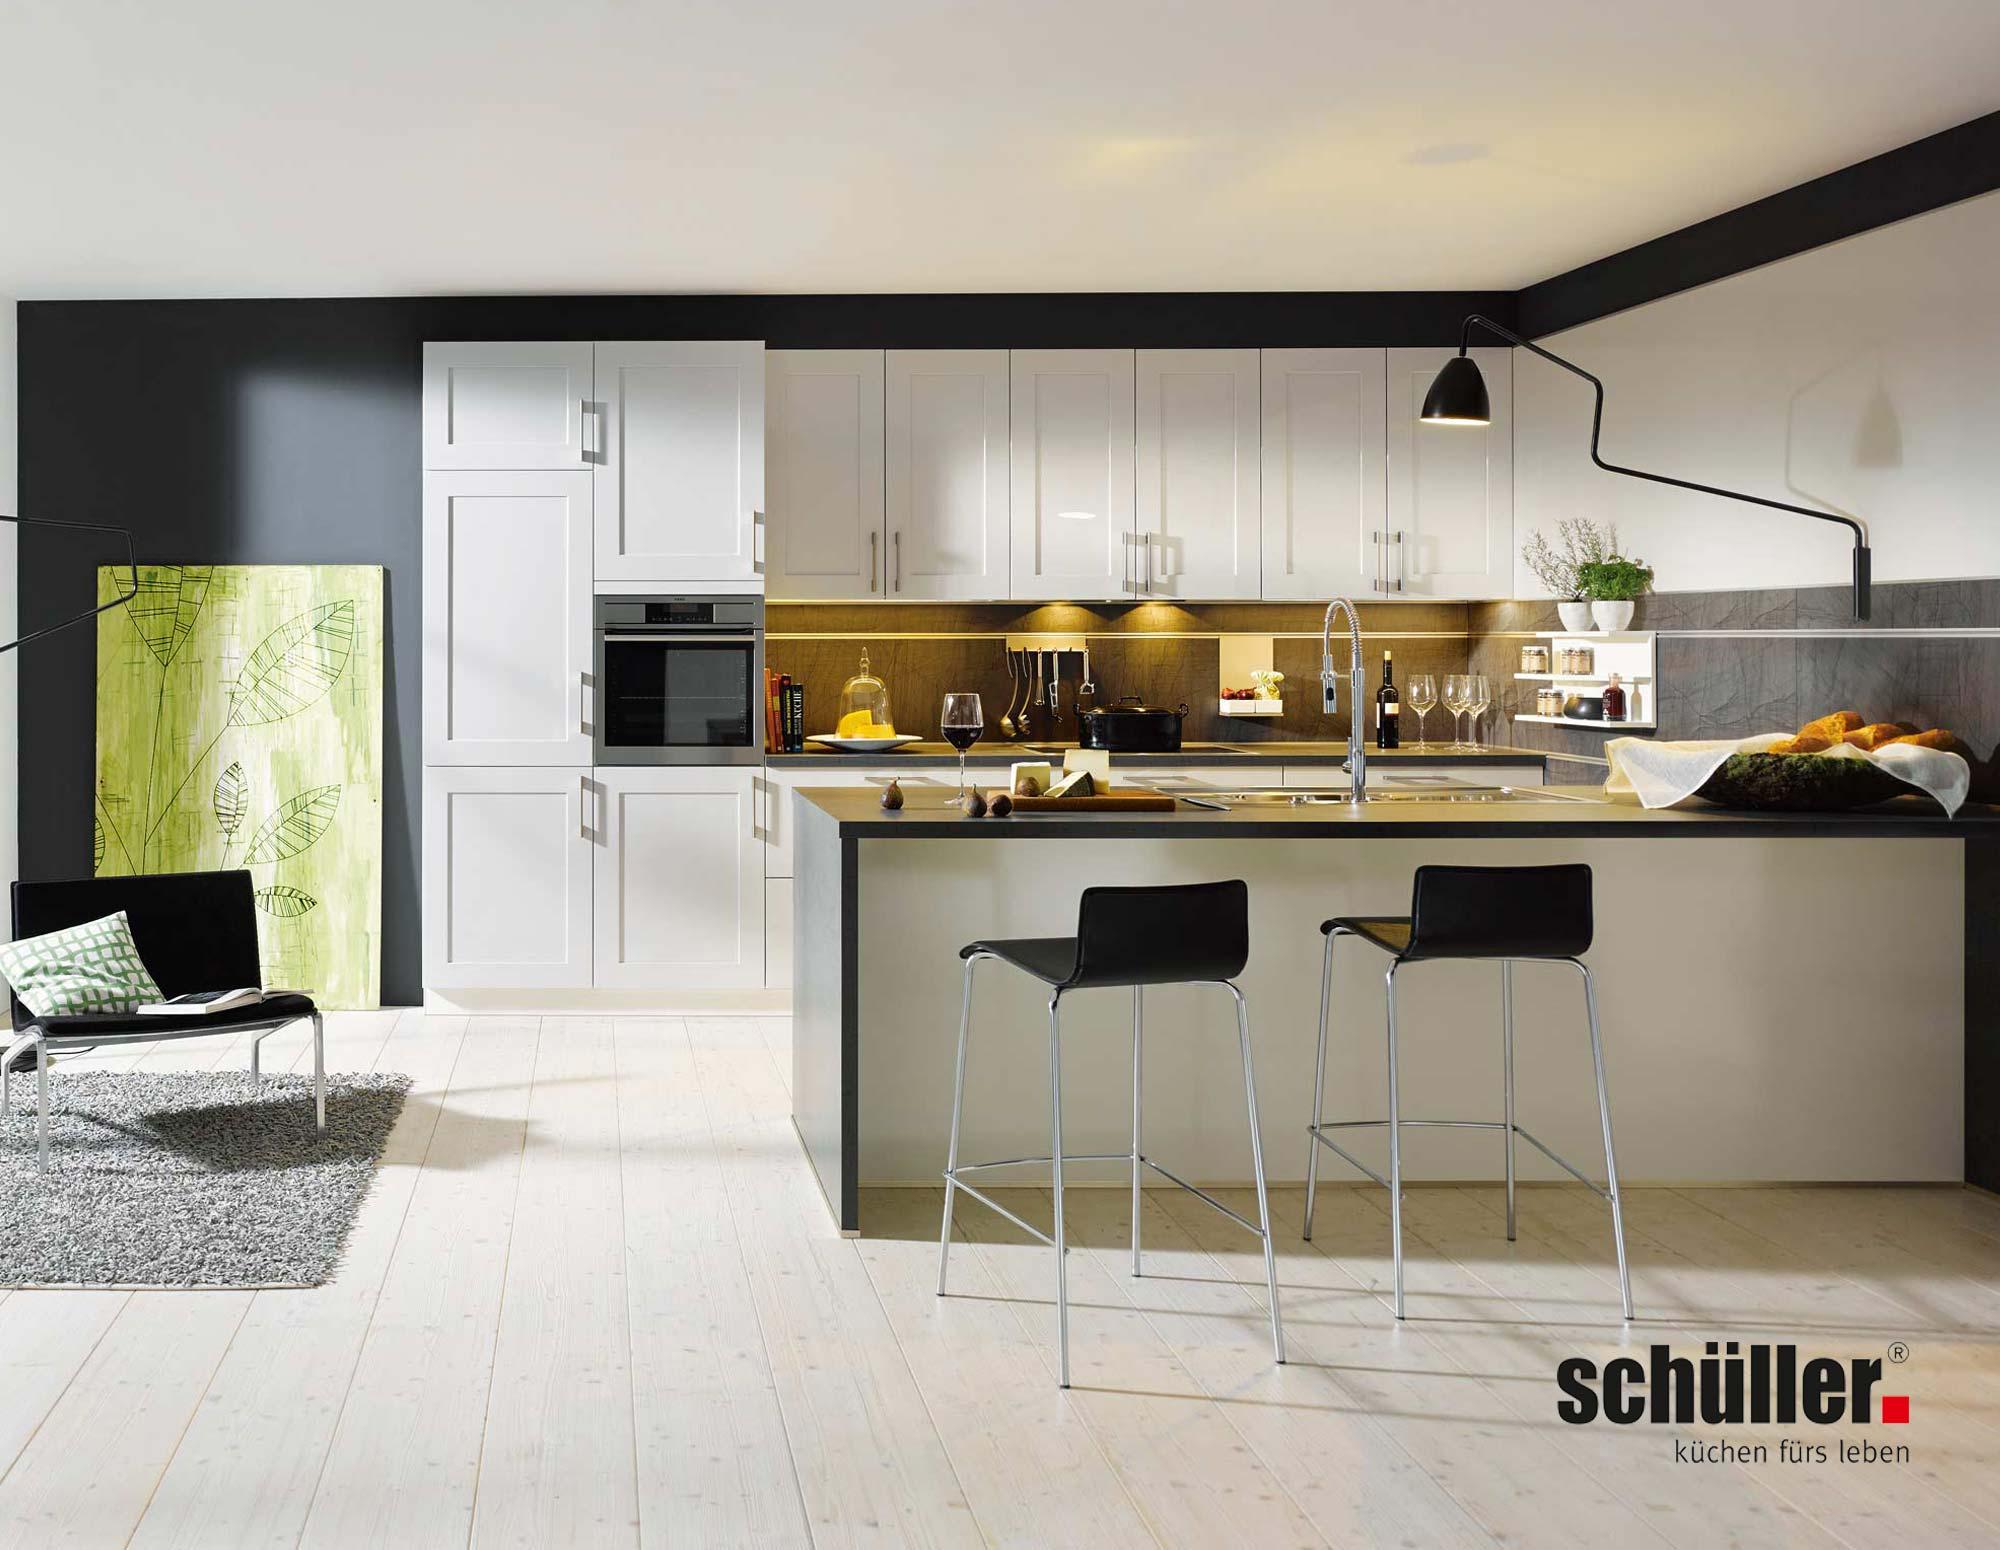 Schüller Malta Wohnküche in Grau